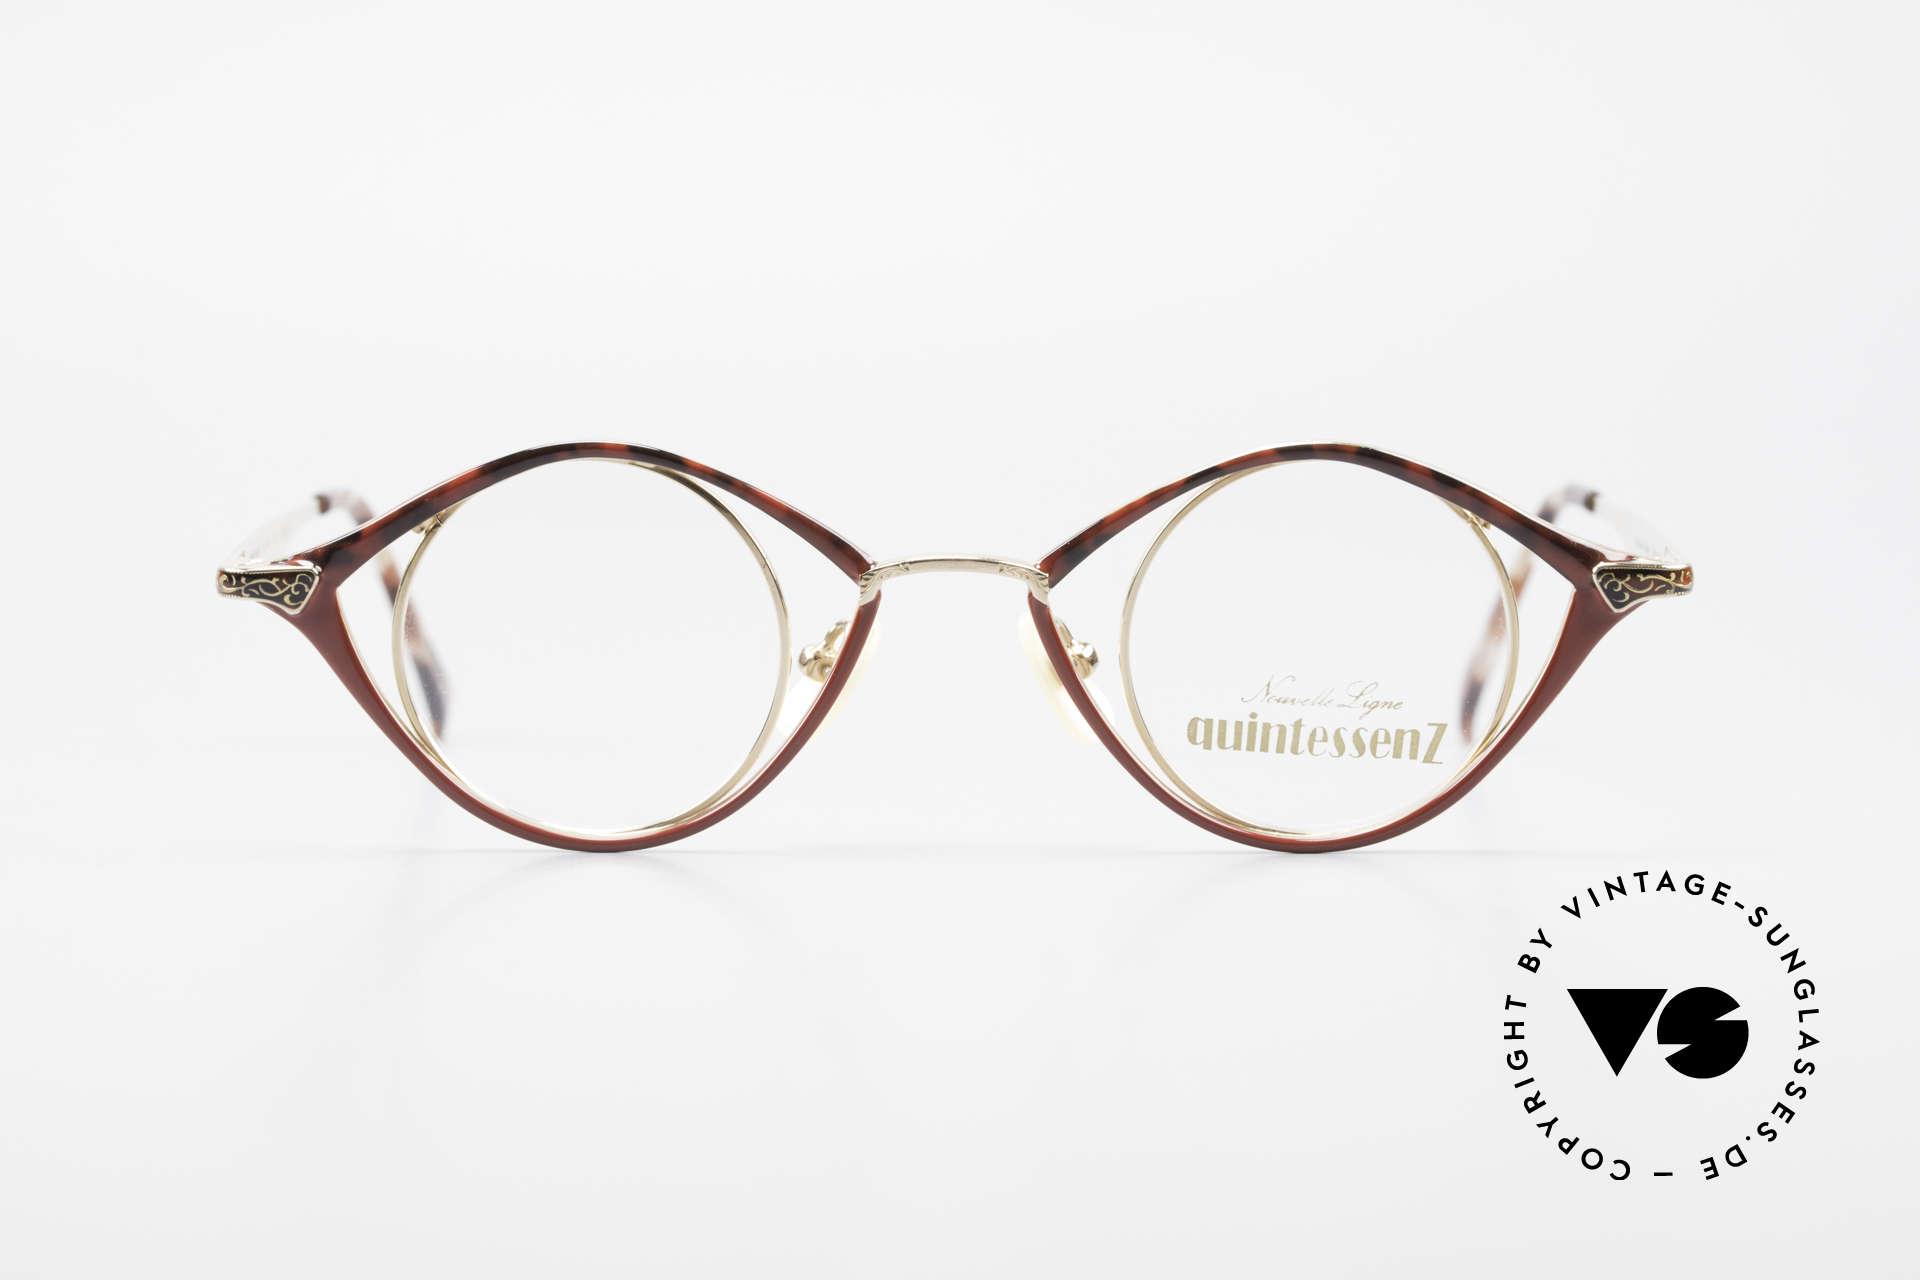 Nouvelle Ligne Q40 Vintage Ladies Specs No Retro, designer glasses from the 90's by Nouvelle Ligne, Made for Women